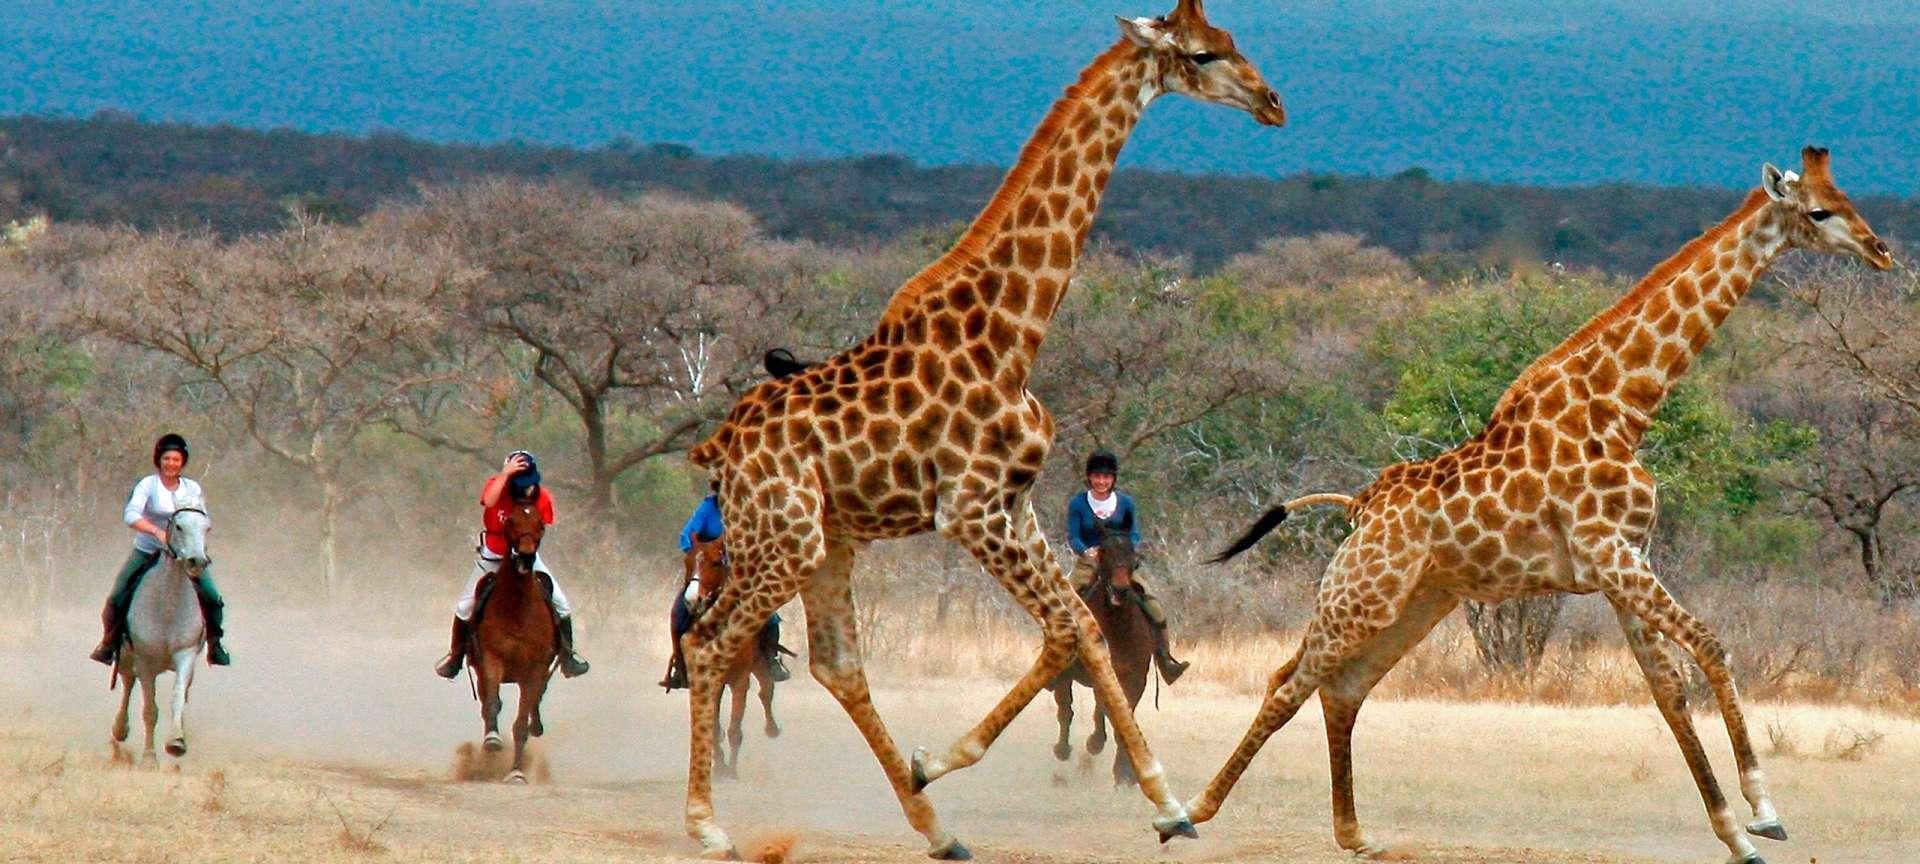 Horseback safaris in Africa - Africa Wildlife Safaris